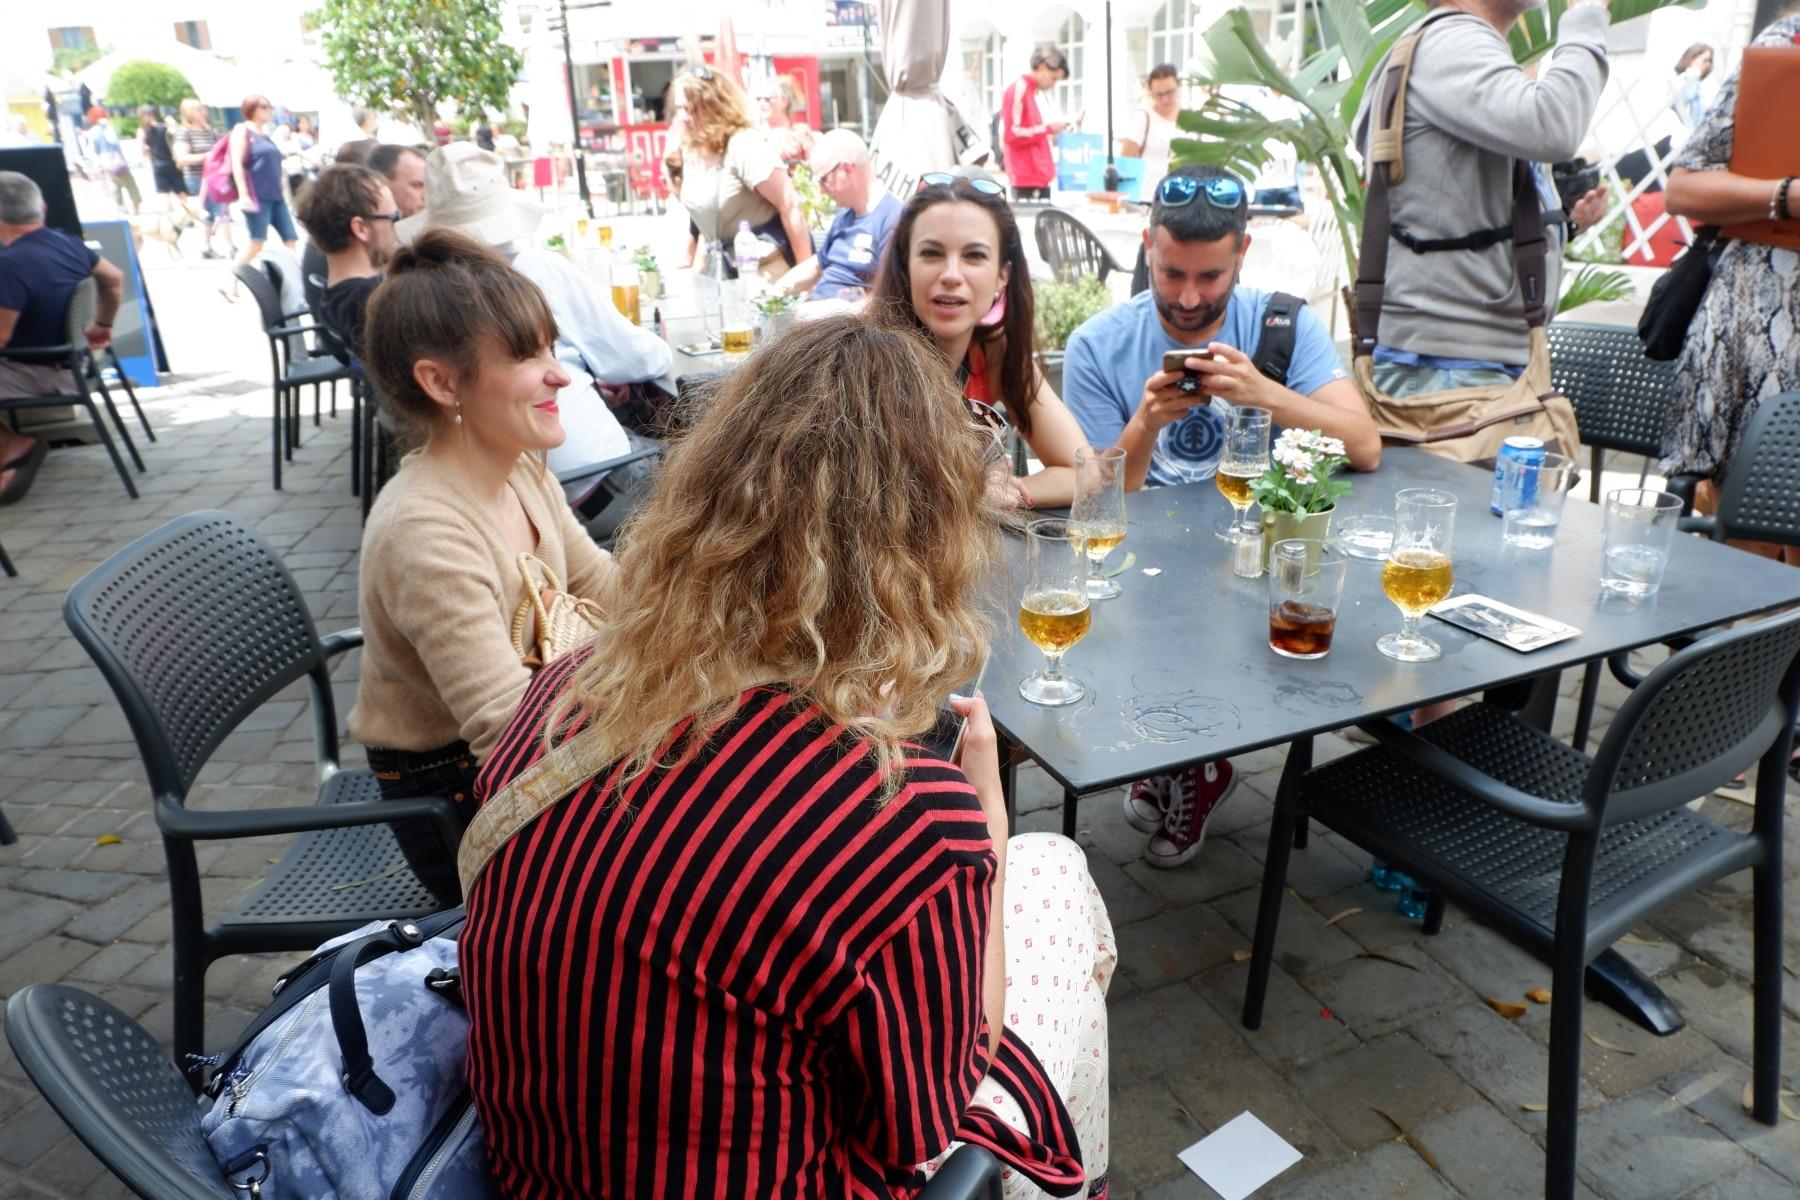 23-jun-2019-blogueros-espaoles-de-viajes-visitan-el-pen_48131072571_o